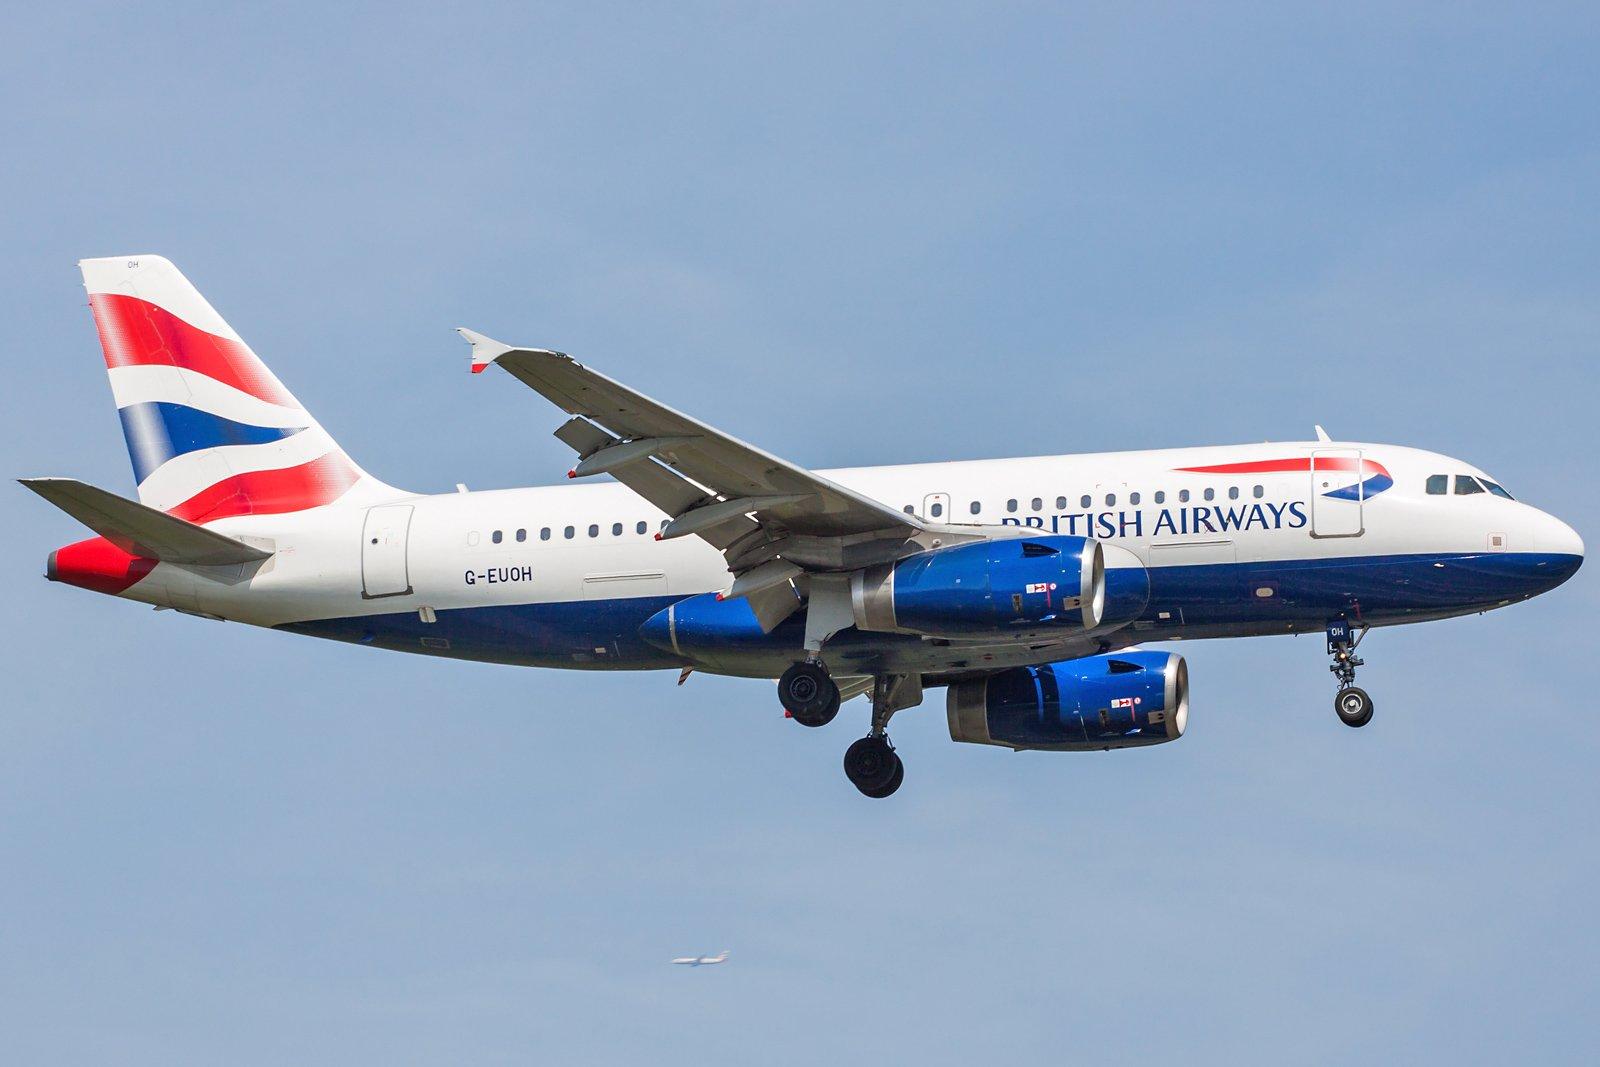 British Airways Airbus A319-131 G-EUOH